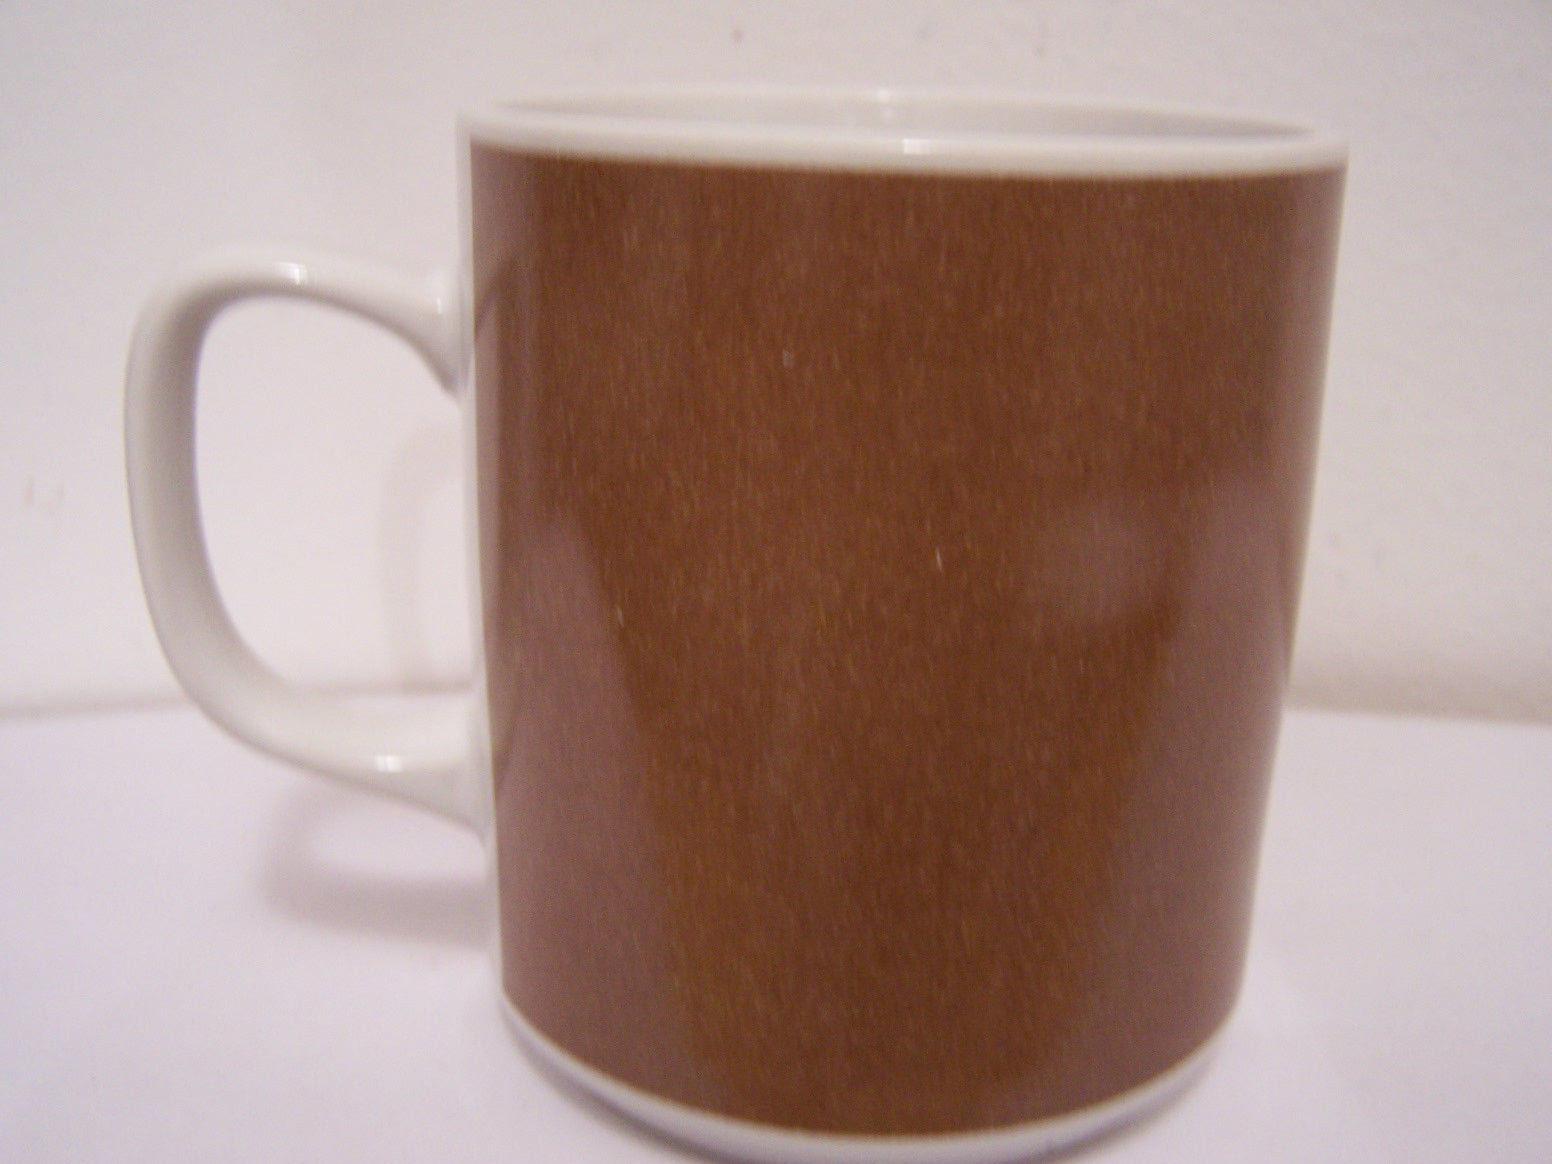 Christmas Mug Mugs Coffee Tea Hot Cocoa and 19 similar items